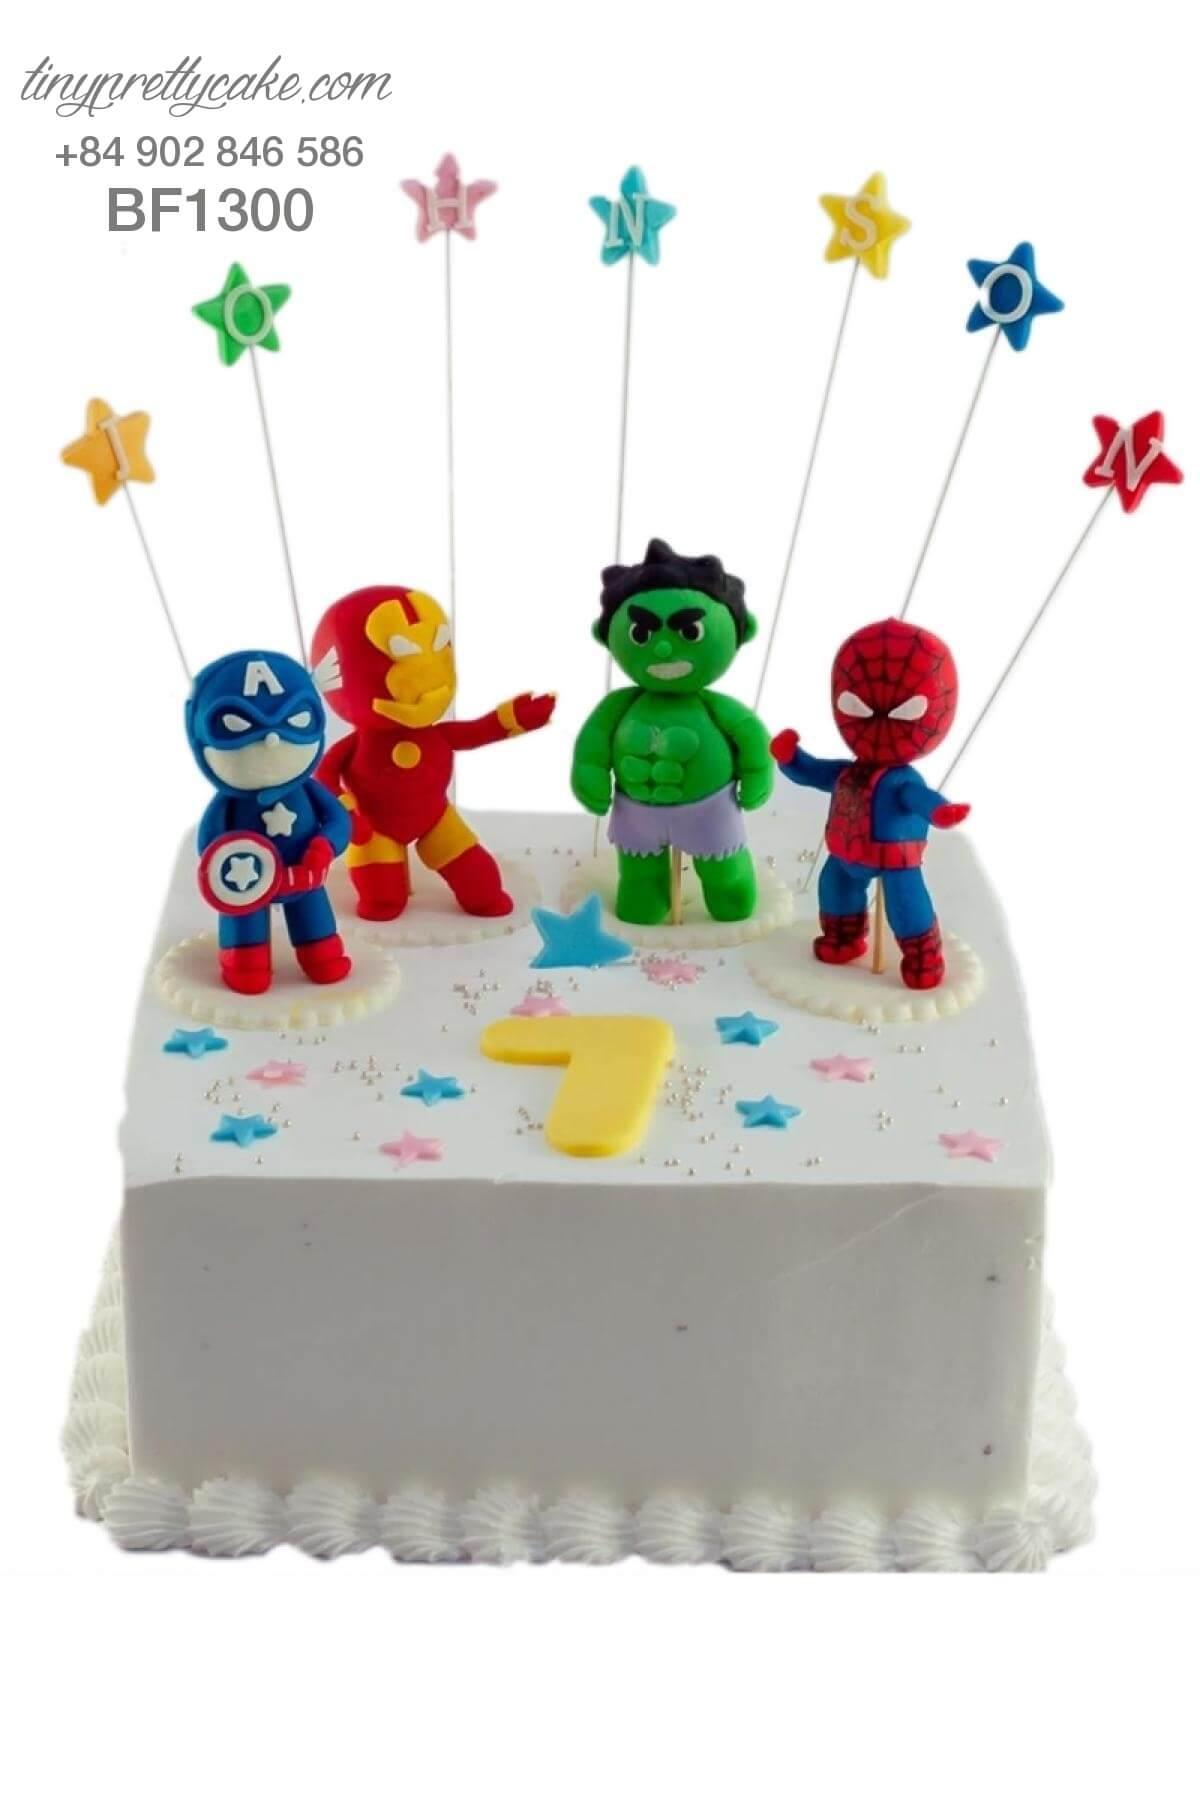 bánh sinh nhật The Avenger